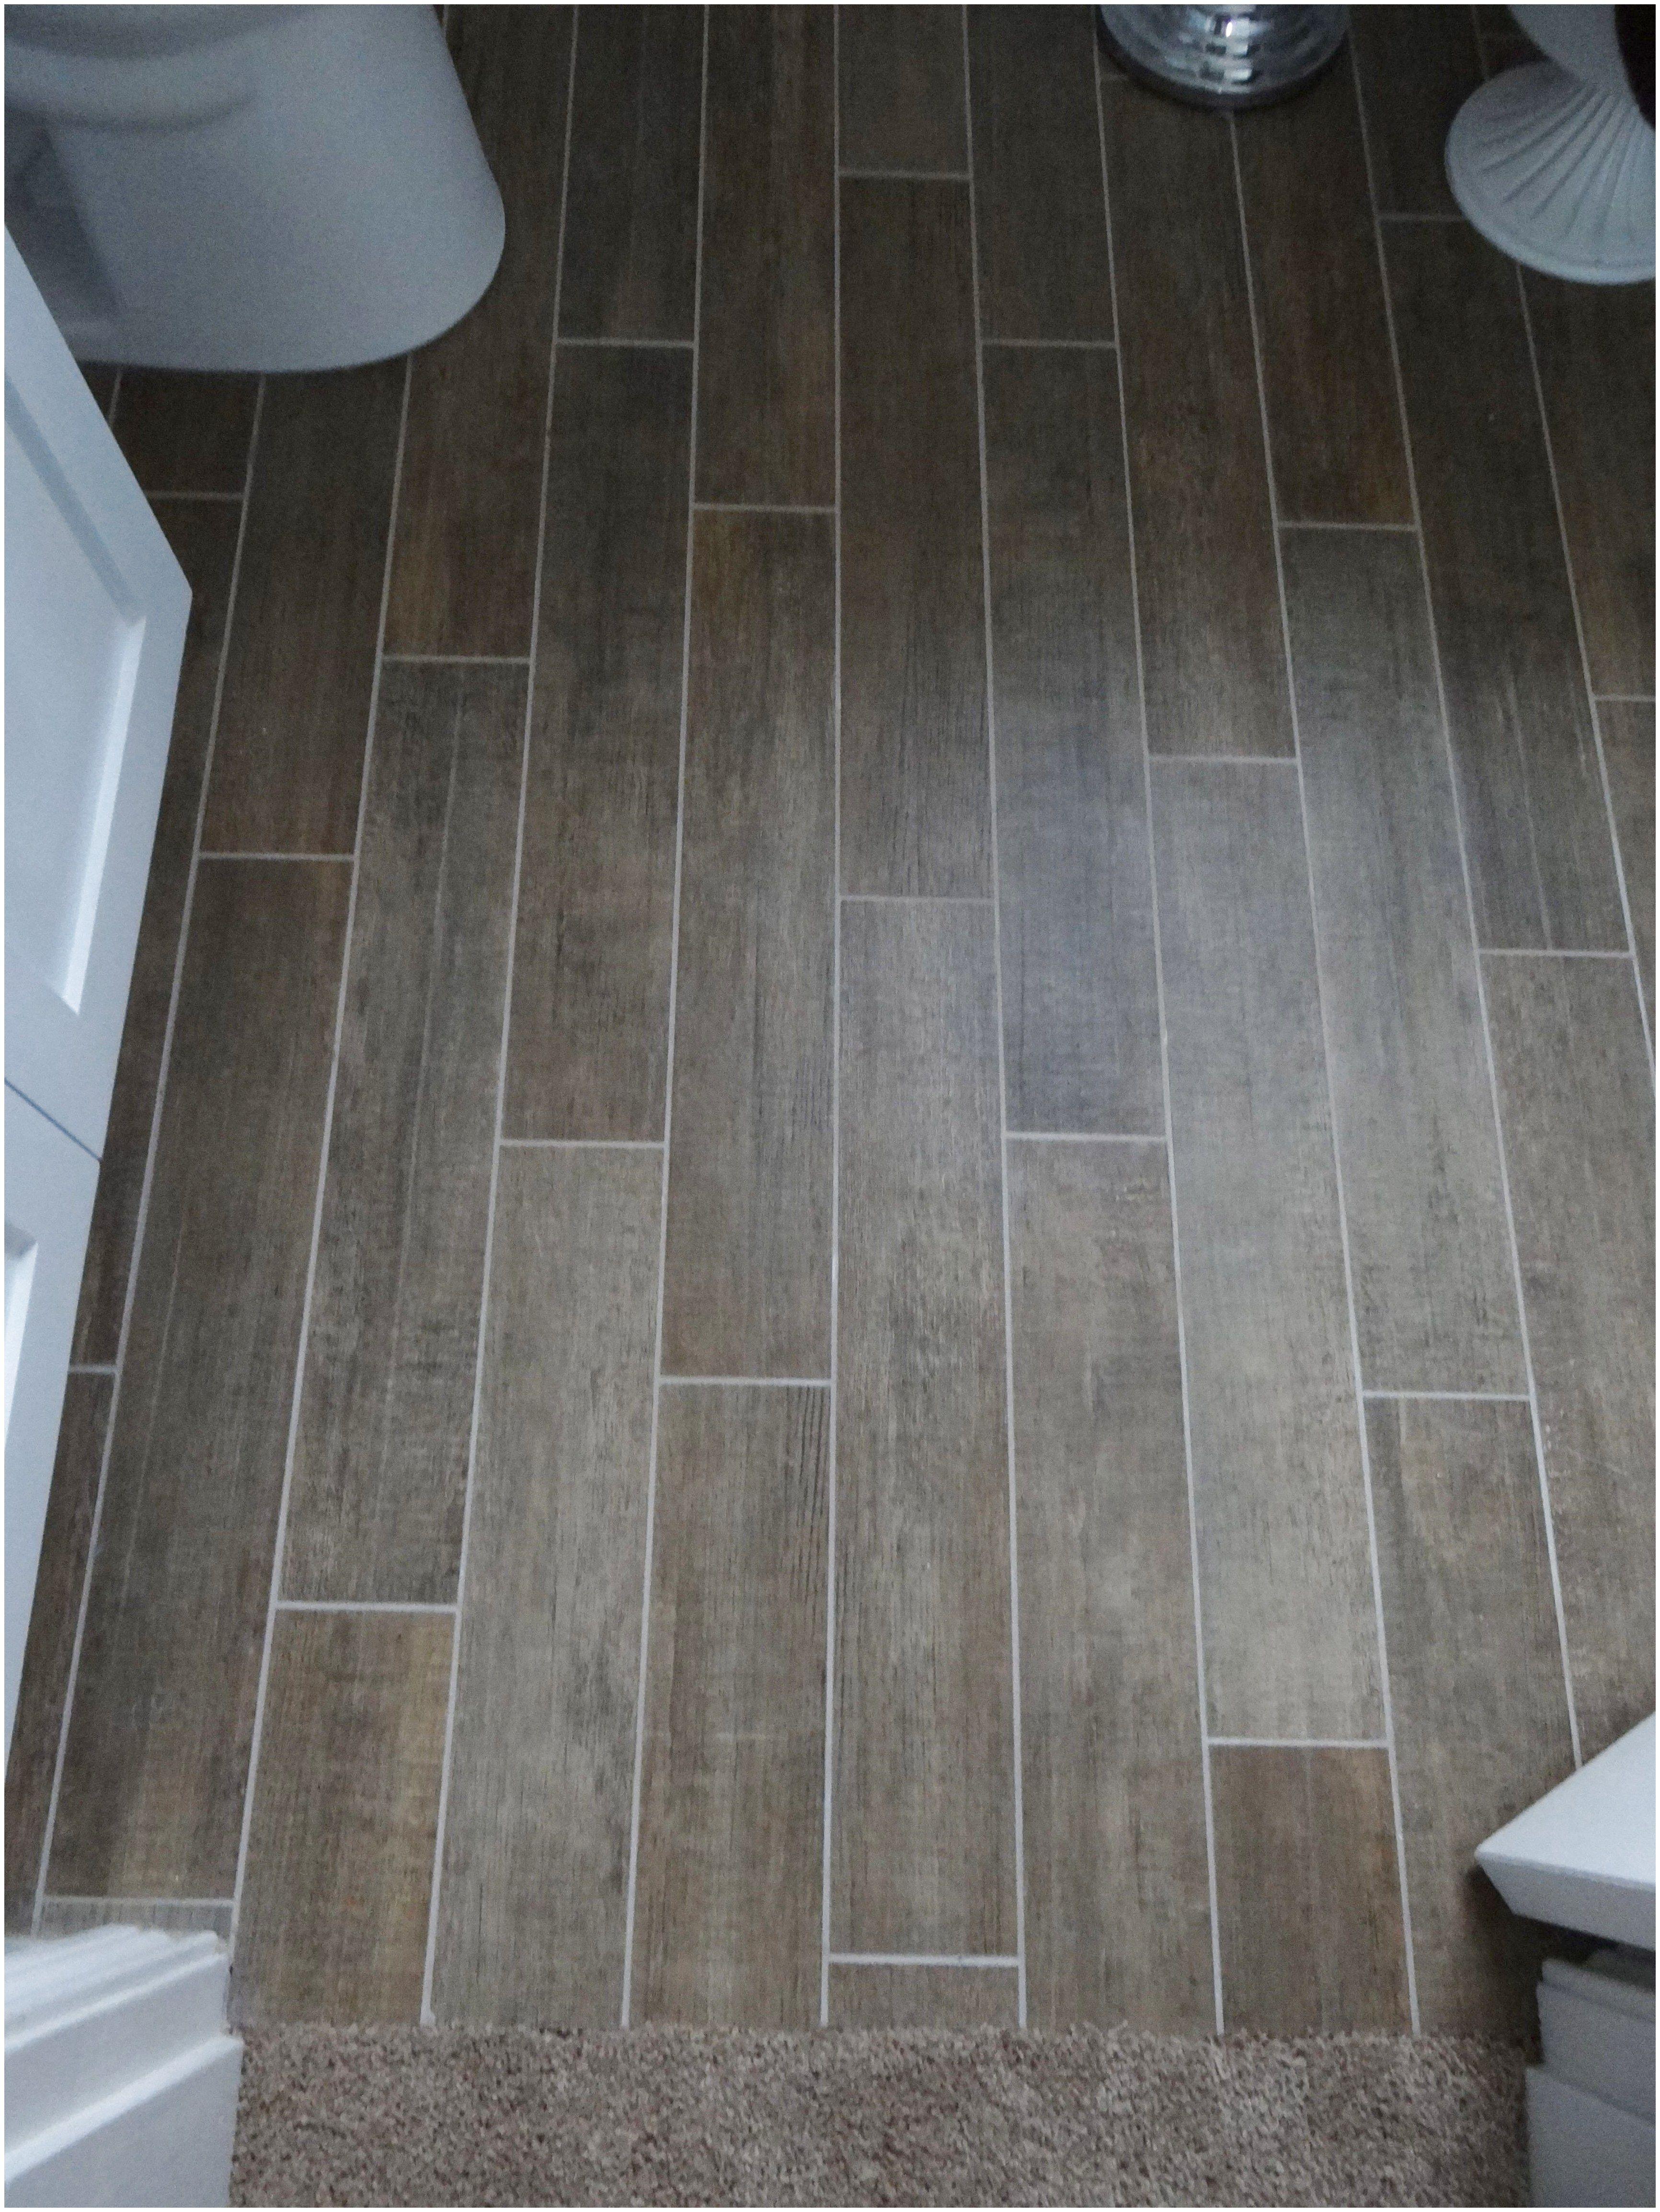 Loving tile floor that looks like wood for the bathrooms